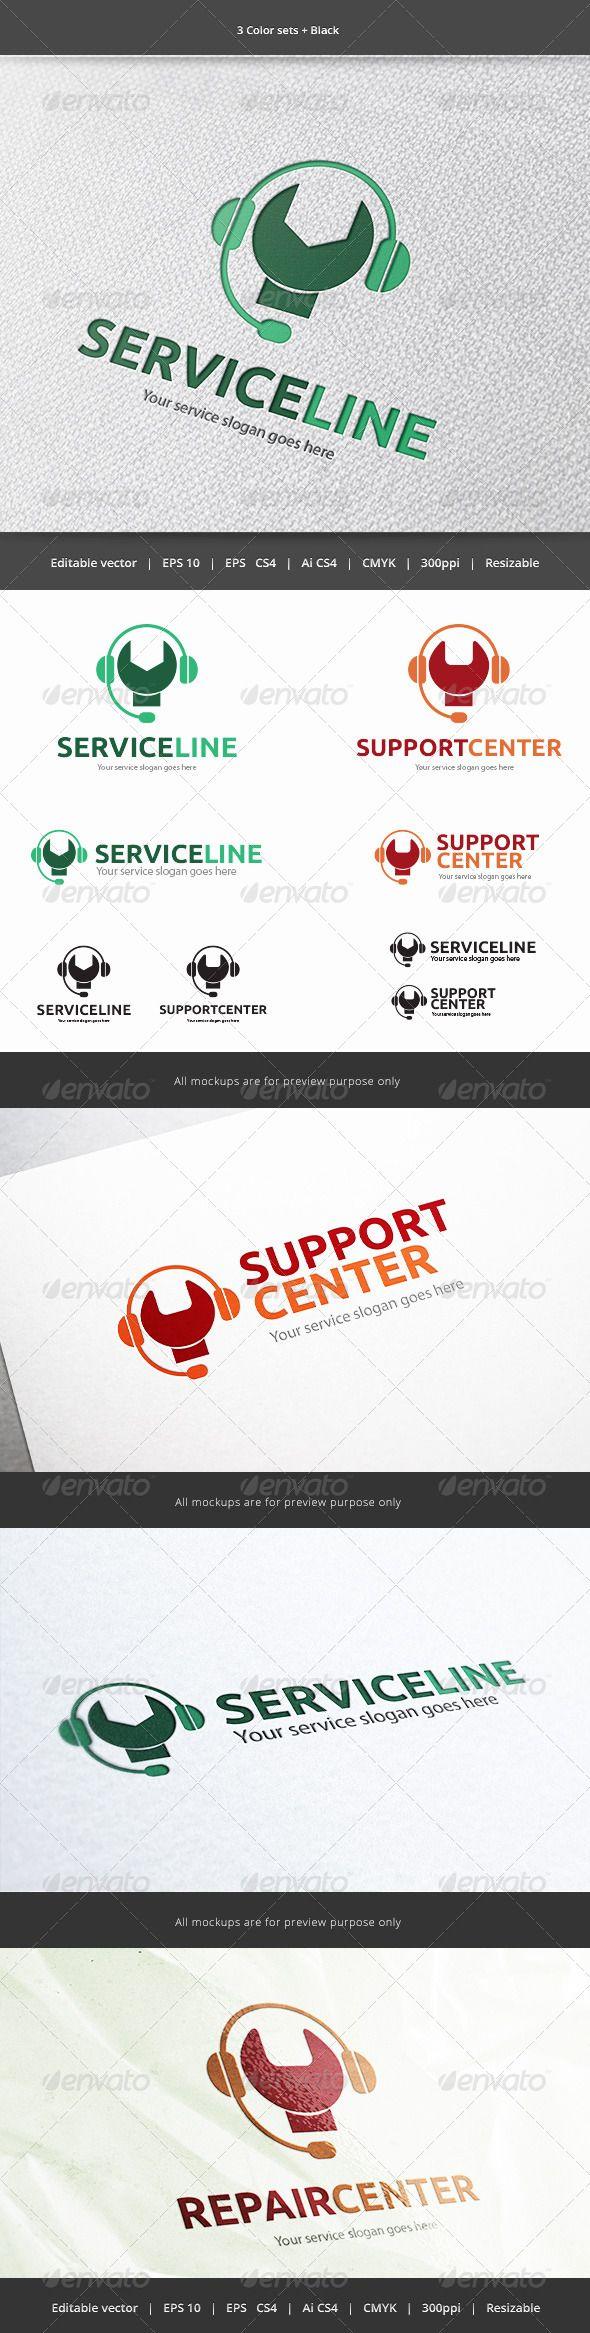 Service Line  - Logo Design Template Vector #logotype Download it here: http://graphicriver.net/item/service-line-logo/5916393?s_rank=1157?ref=nexion